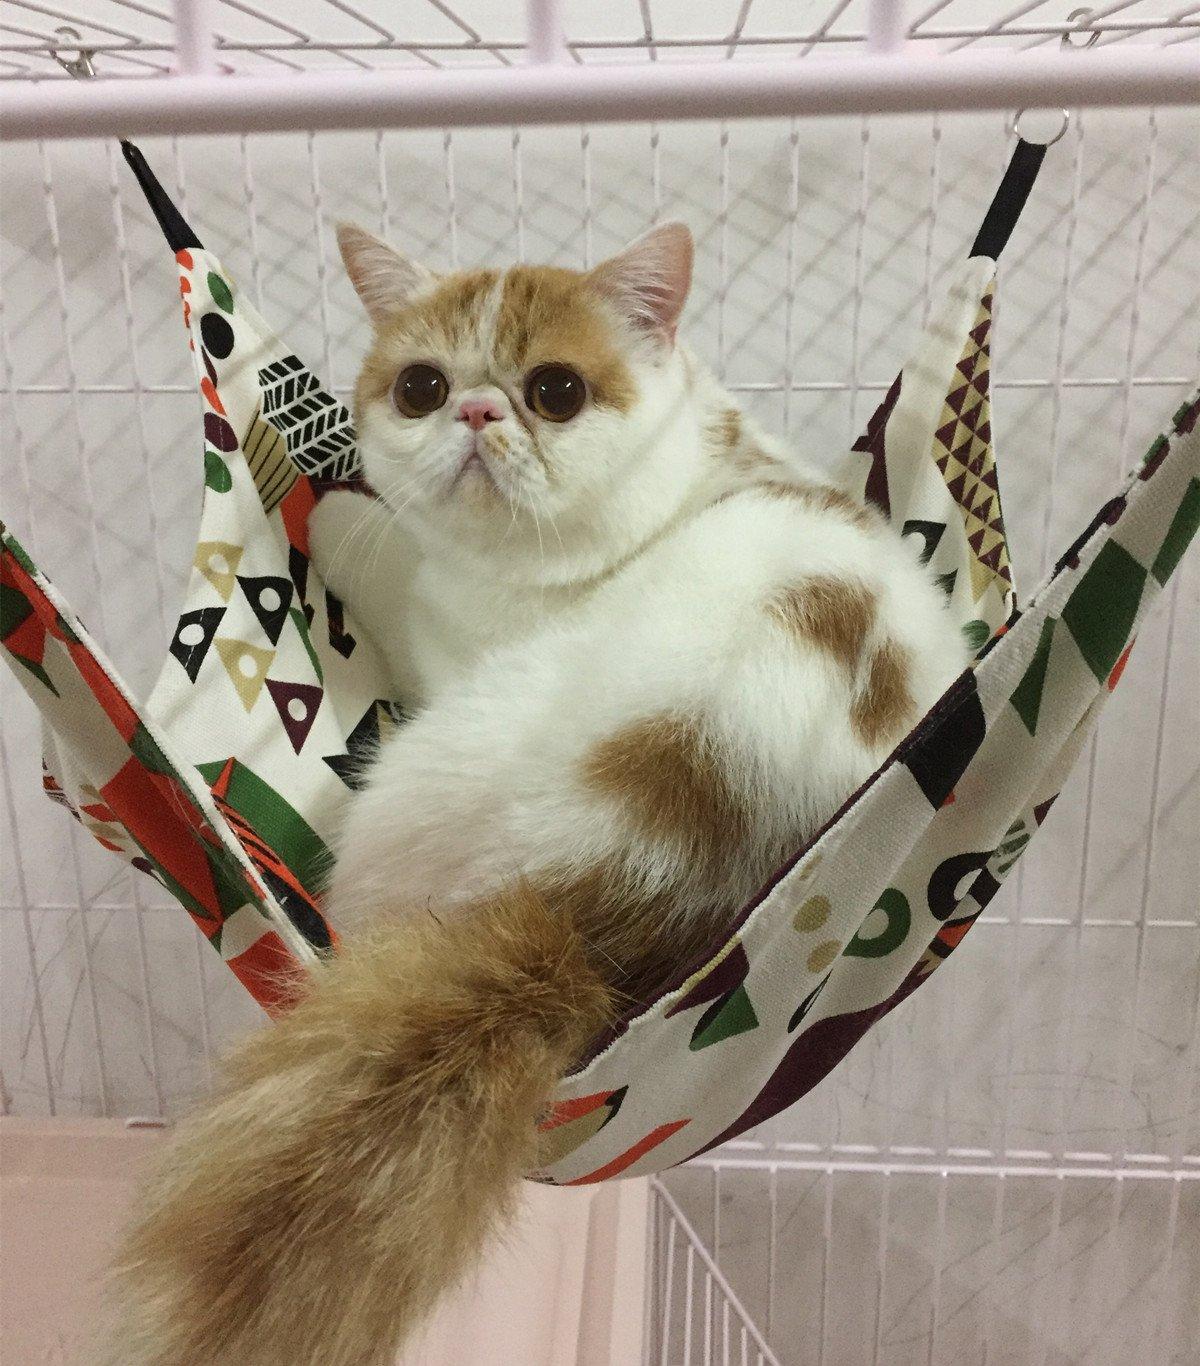 Margelo Pet Cage Hammock, Cat Ferret Hammock Bed for Bunny/Rabbit/Rat/Small Animals 5